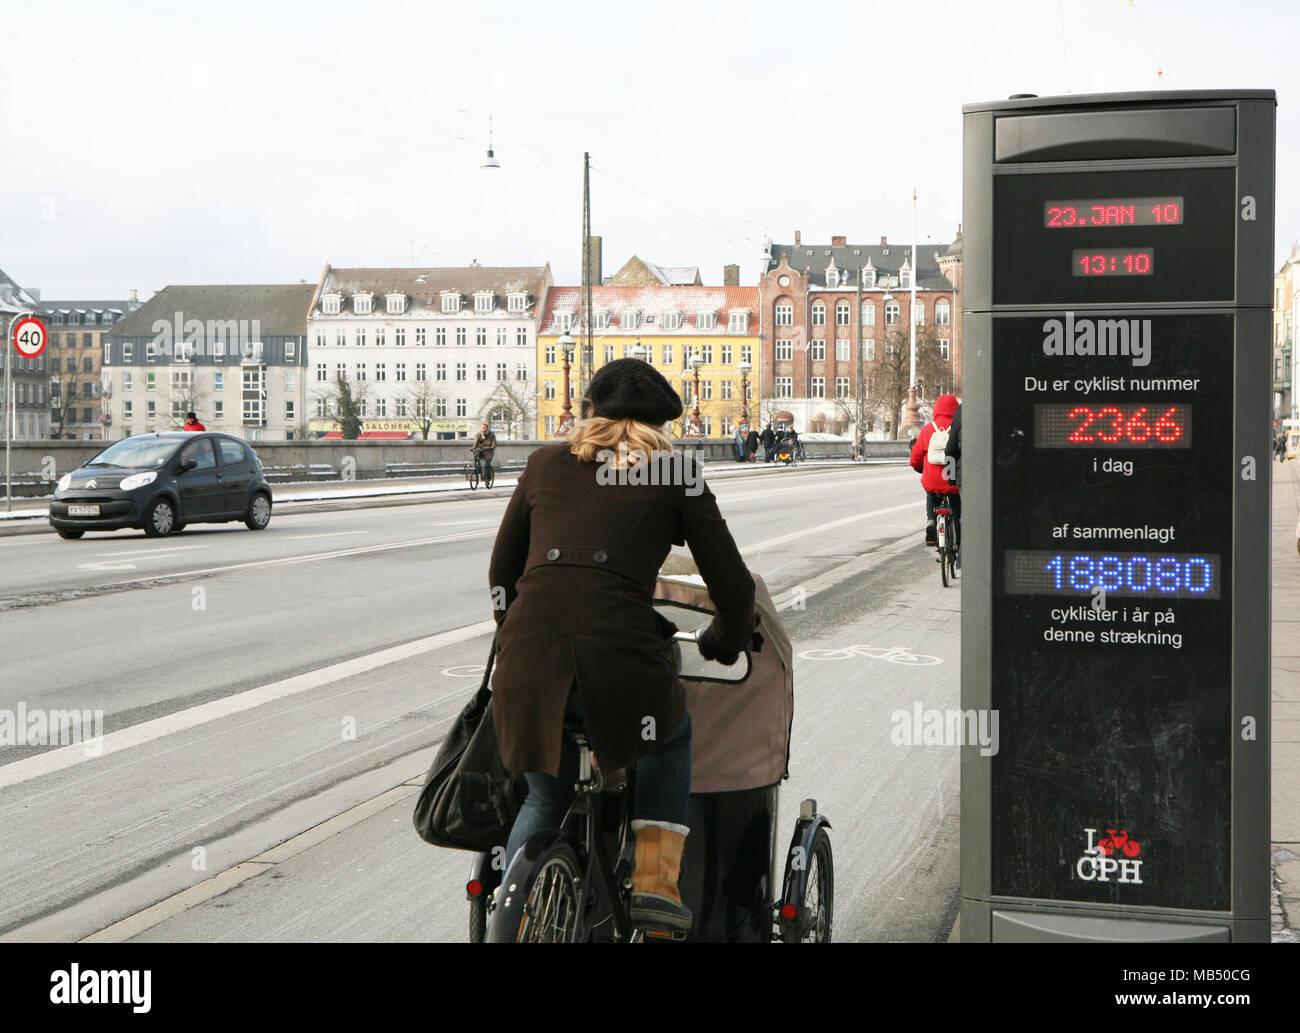 Contador de ciclos, Copenhague, Dinamarca Imagen De Stock